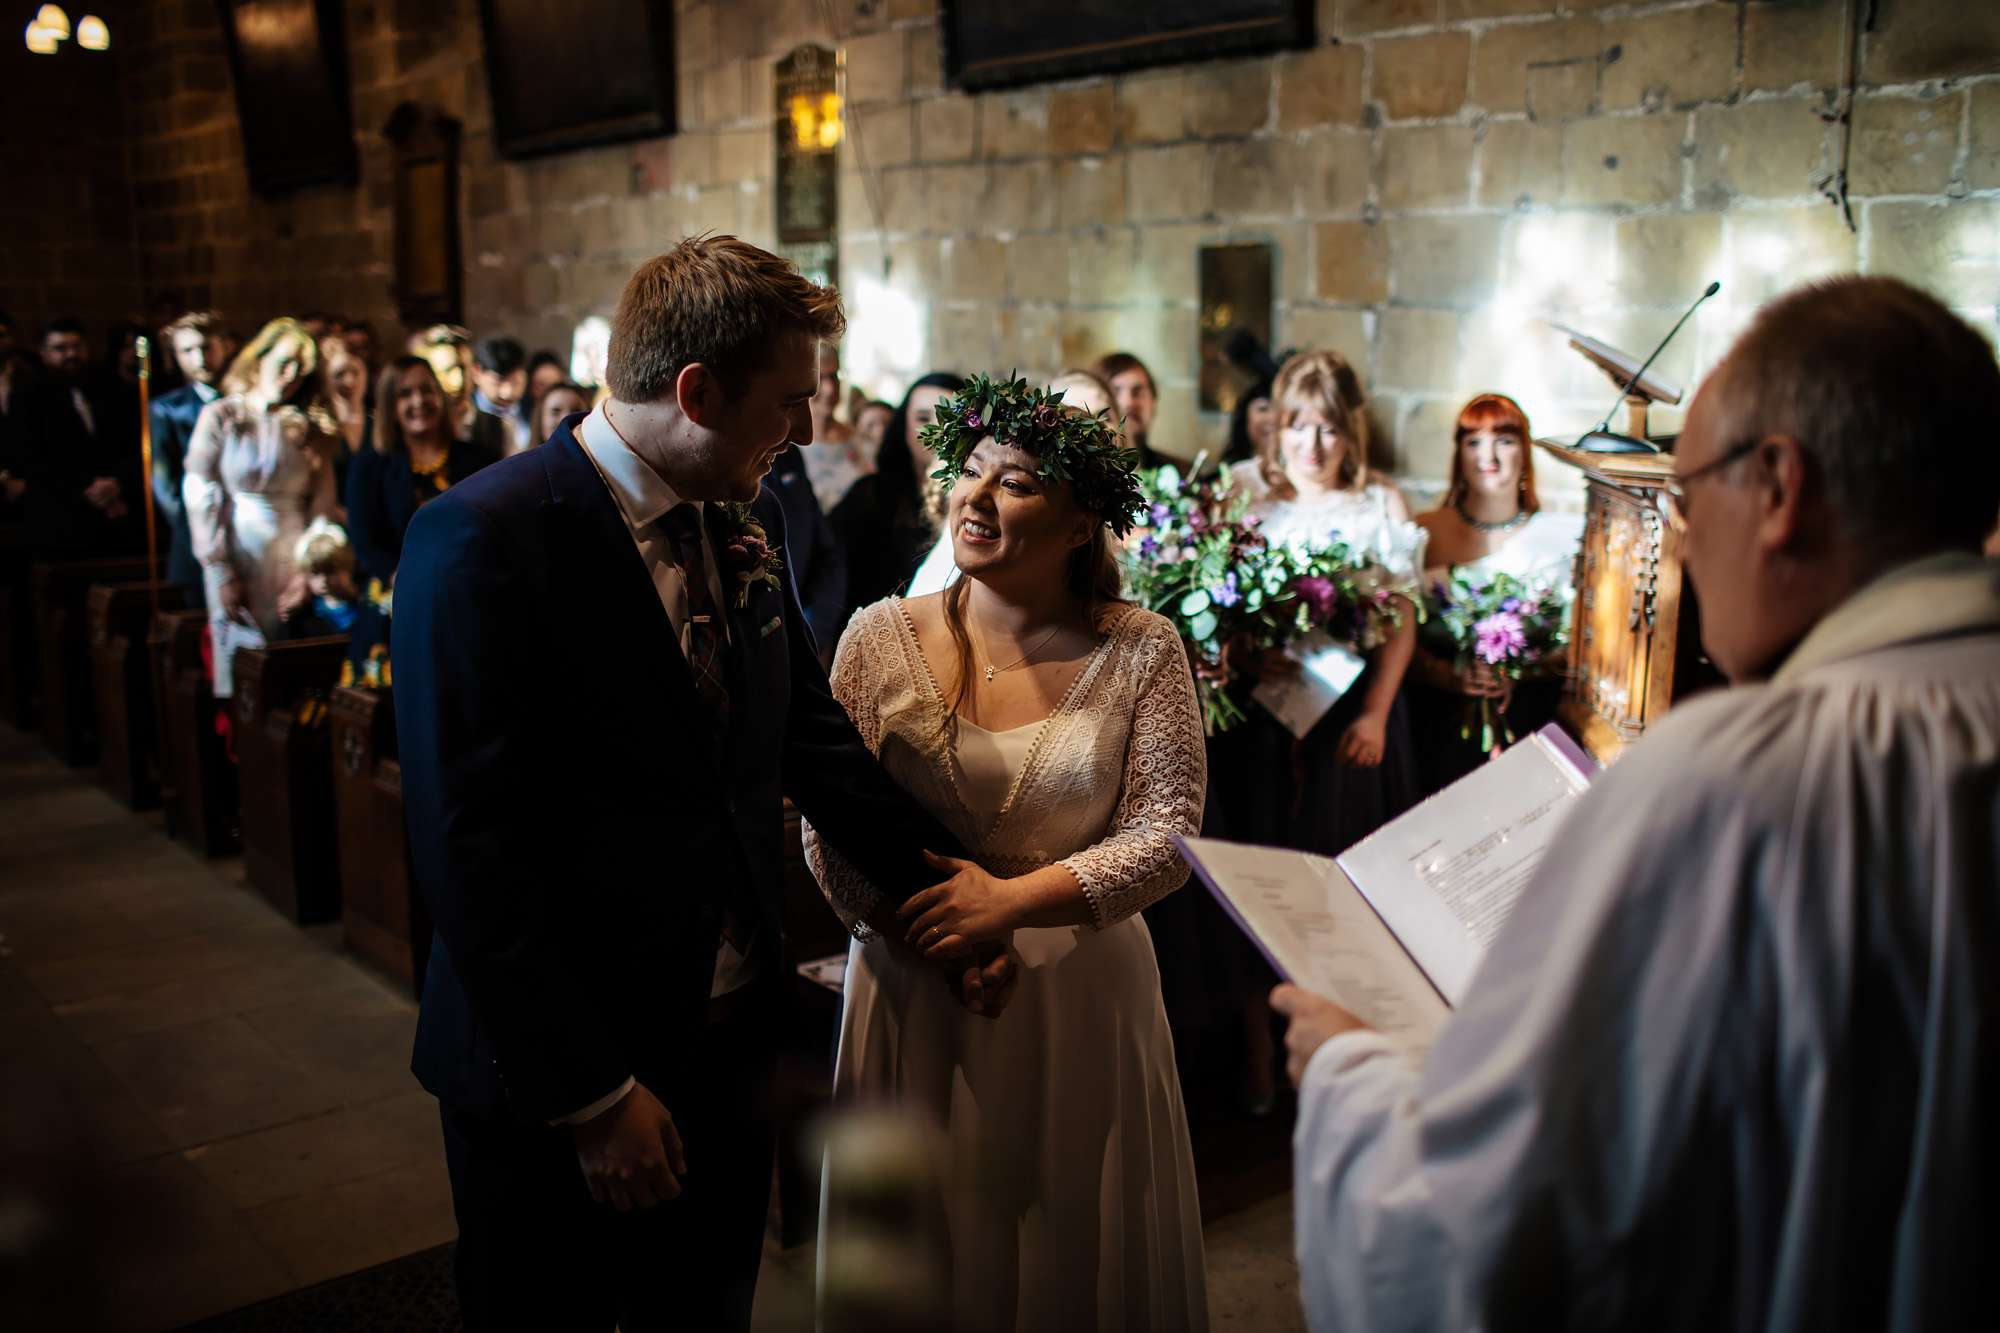 Church wedding ceremony in Leeds Yorkshire